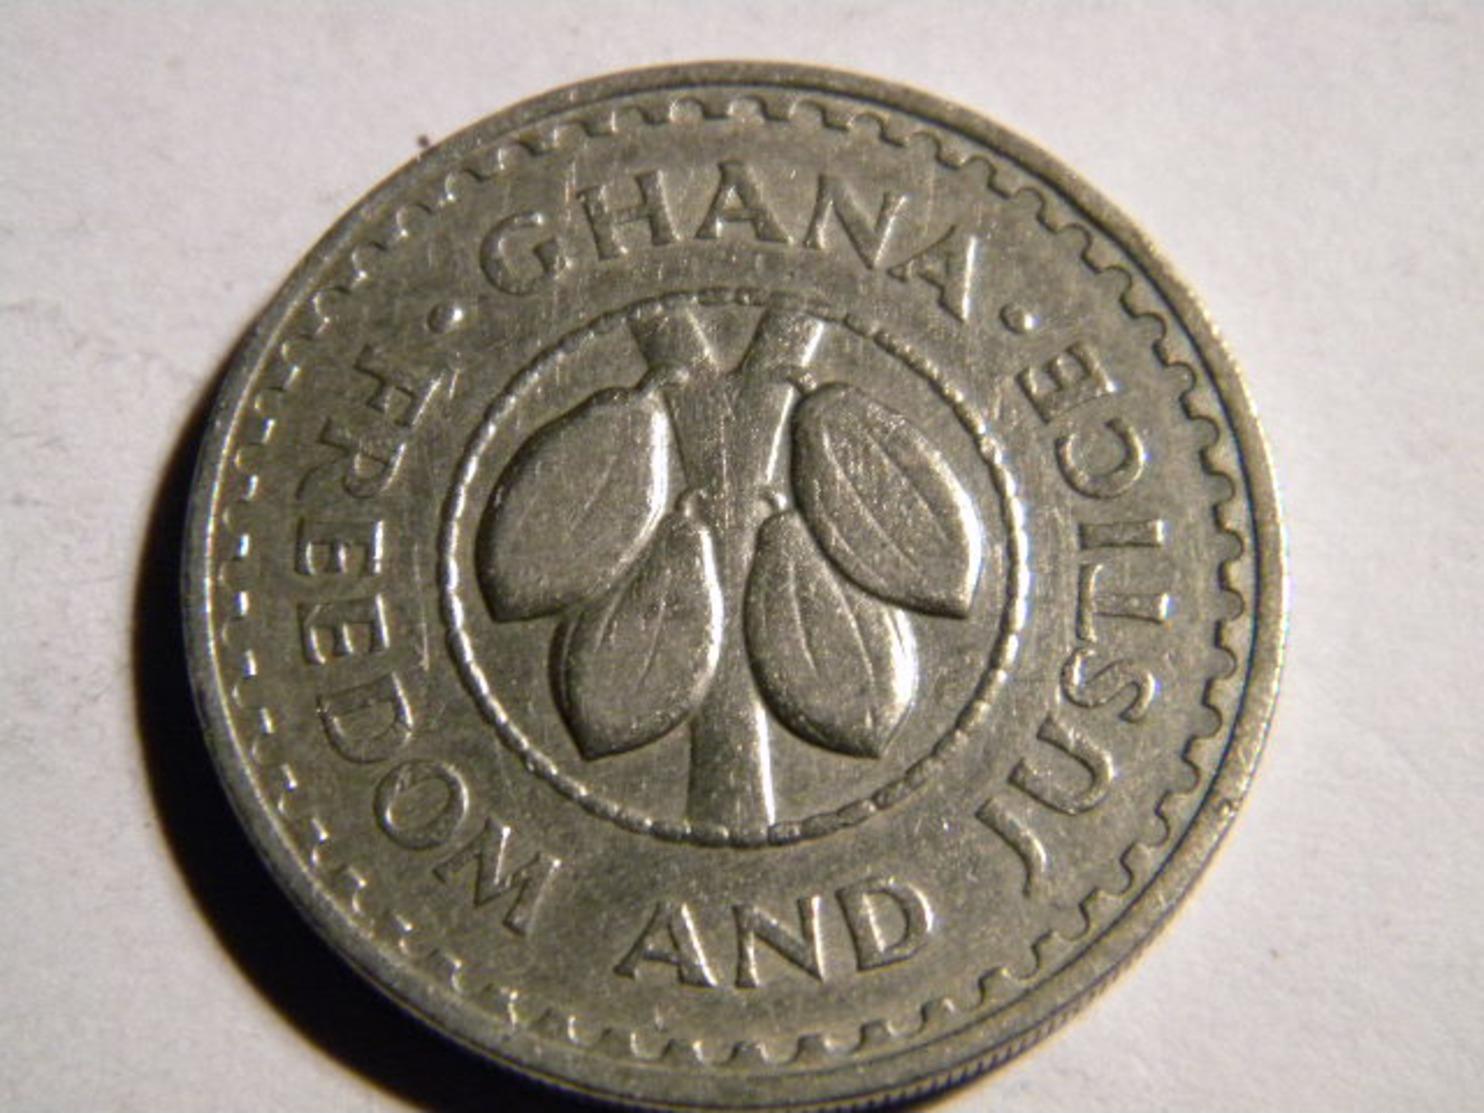 GHANA - 20 PESEWAS 1967. - Ghana